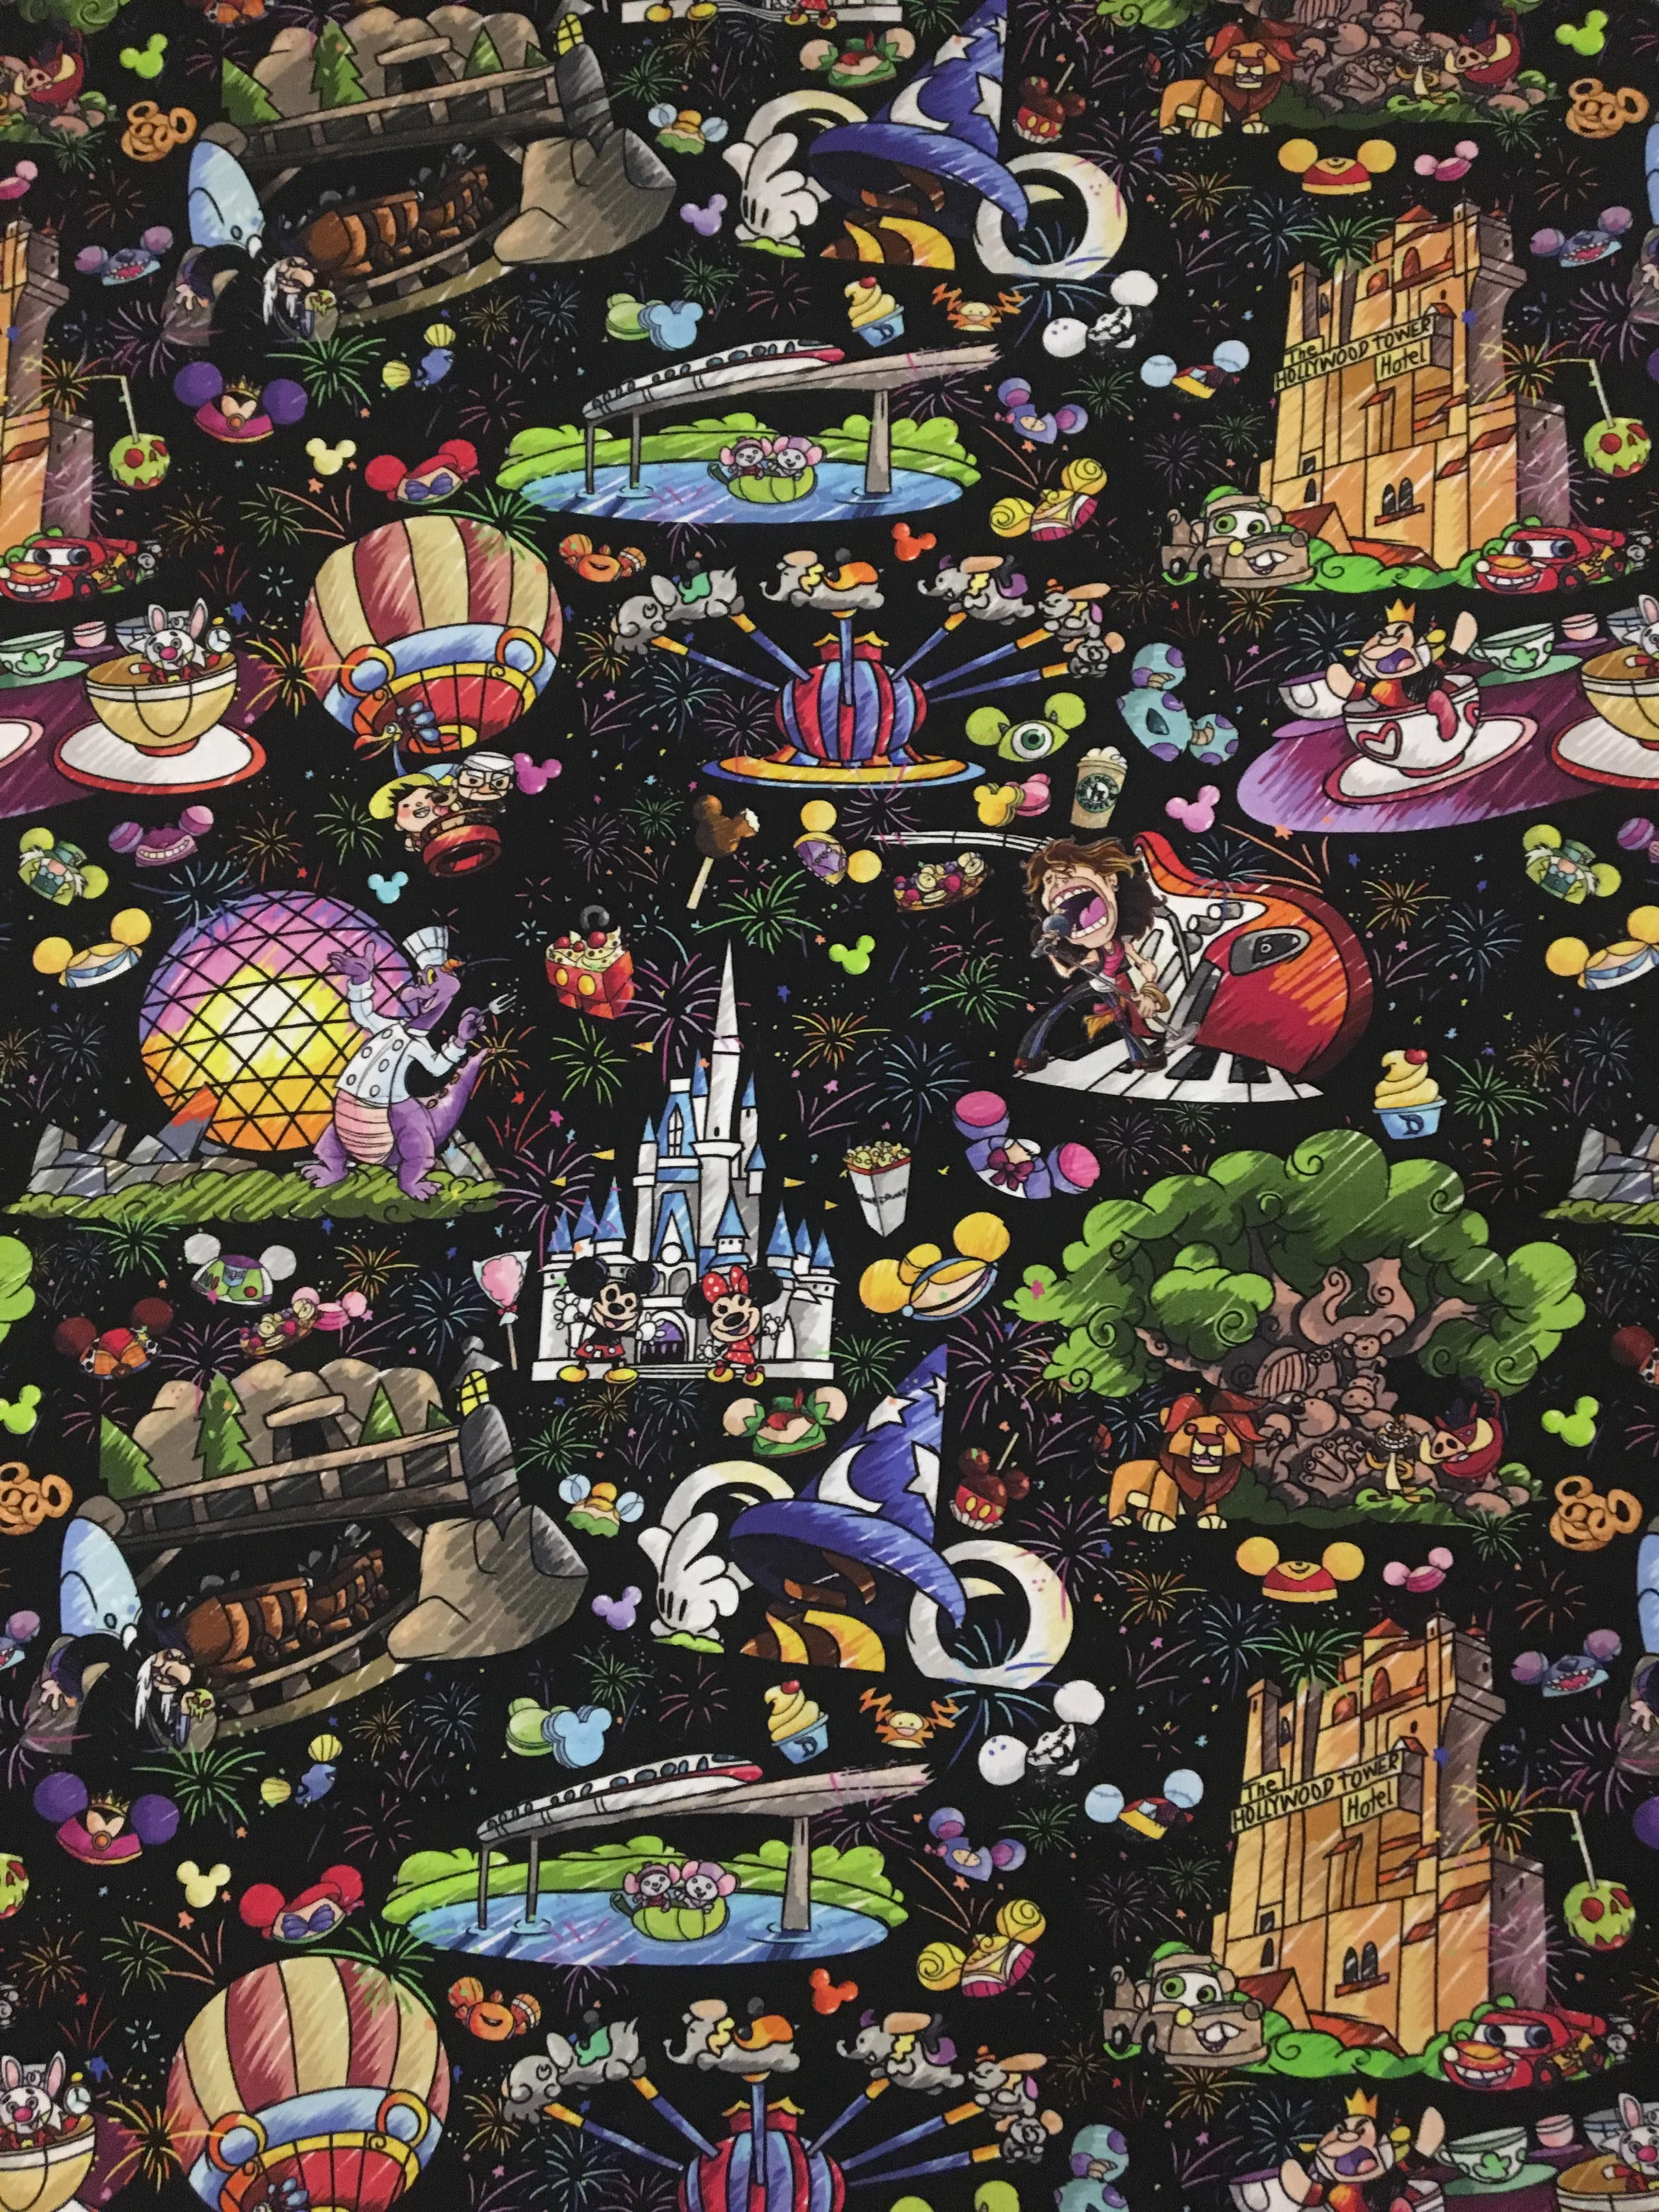 Disney Wallpaper Disney Fabric Walt Disney World Disneyland Disney Collage Cute Disney Wallpaper Disney Wallpaper